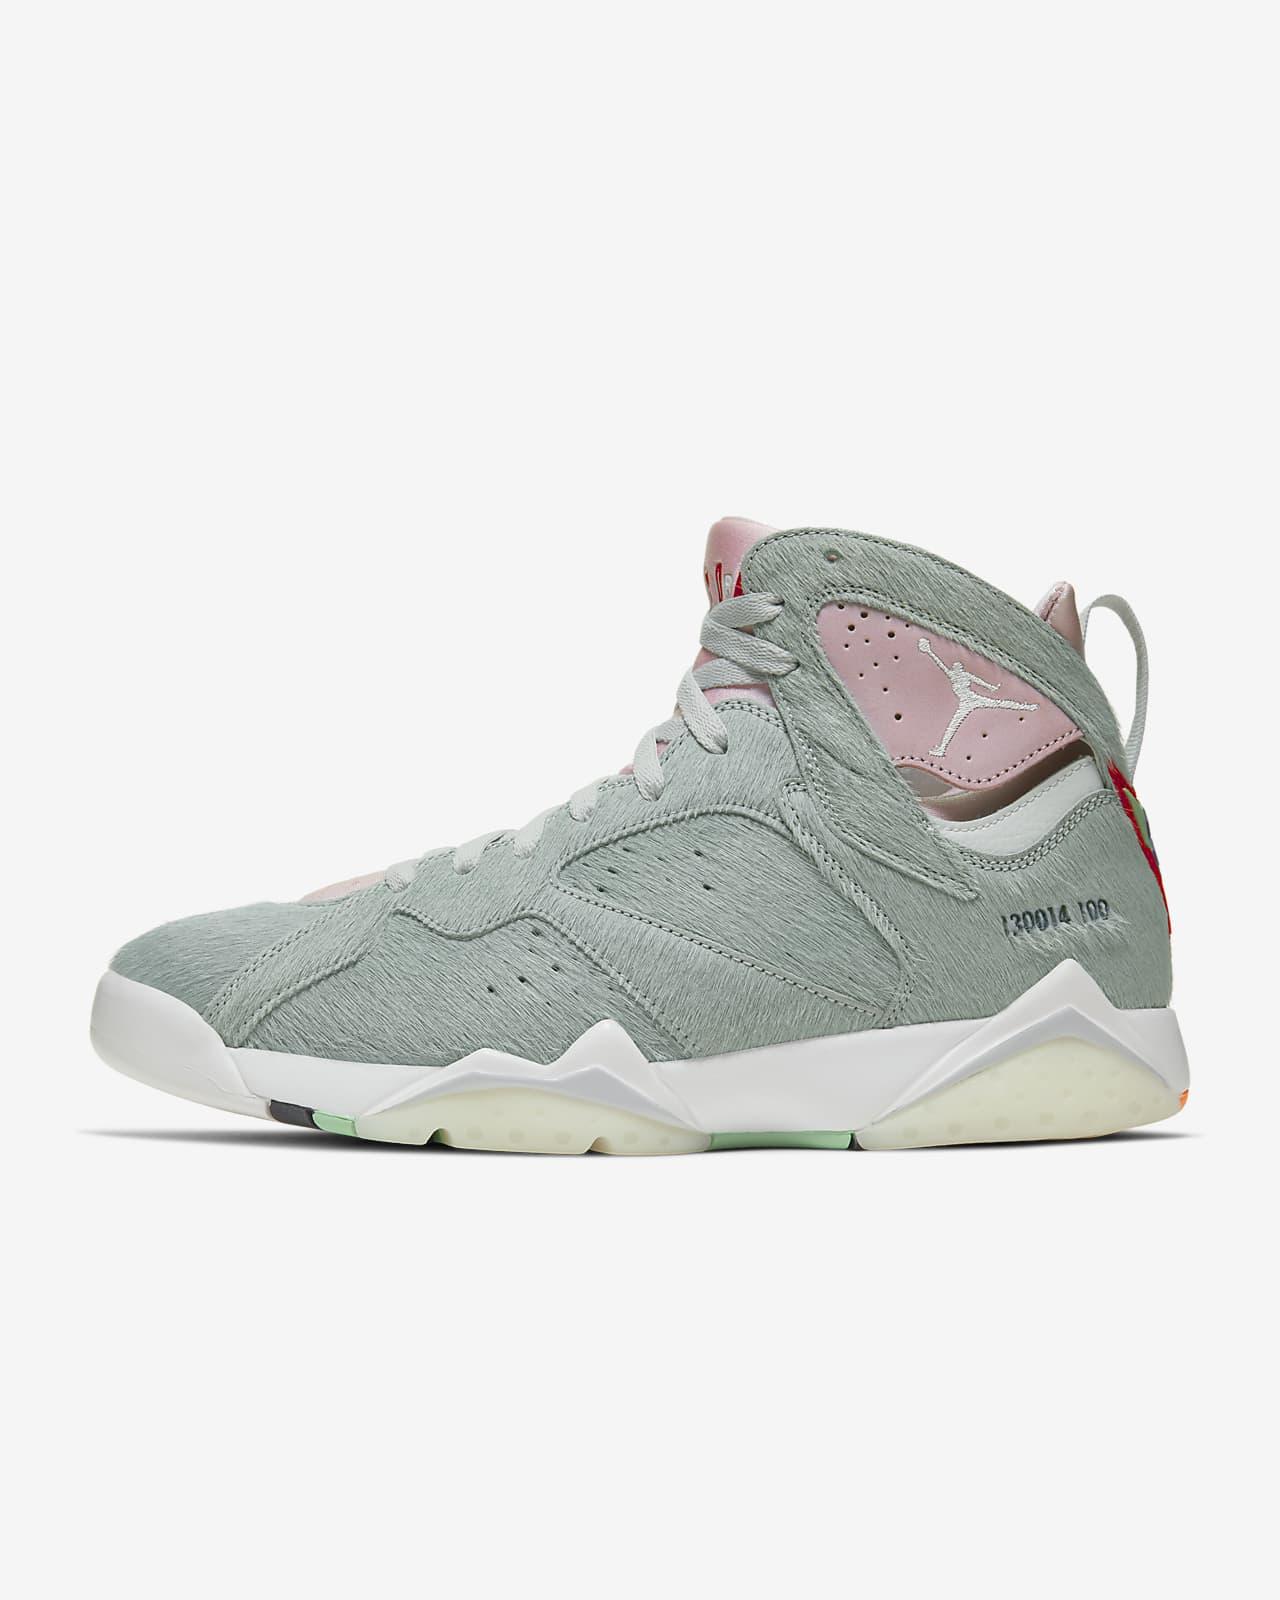 Air Jordan 7 Retro SE Shoes